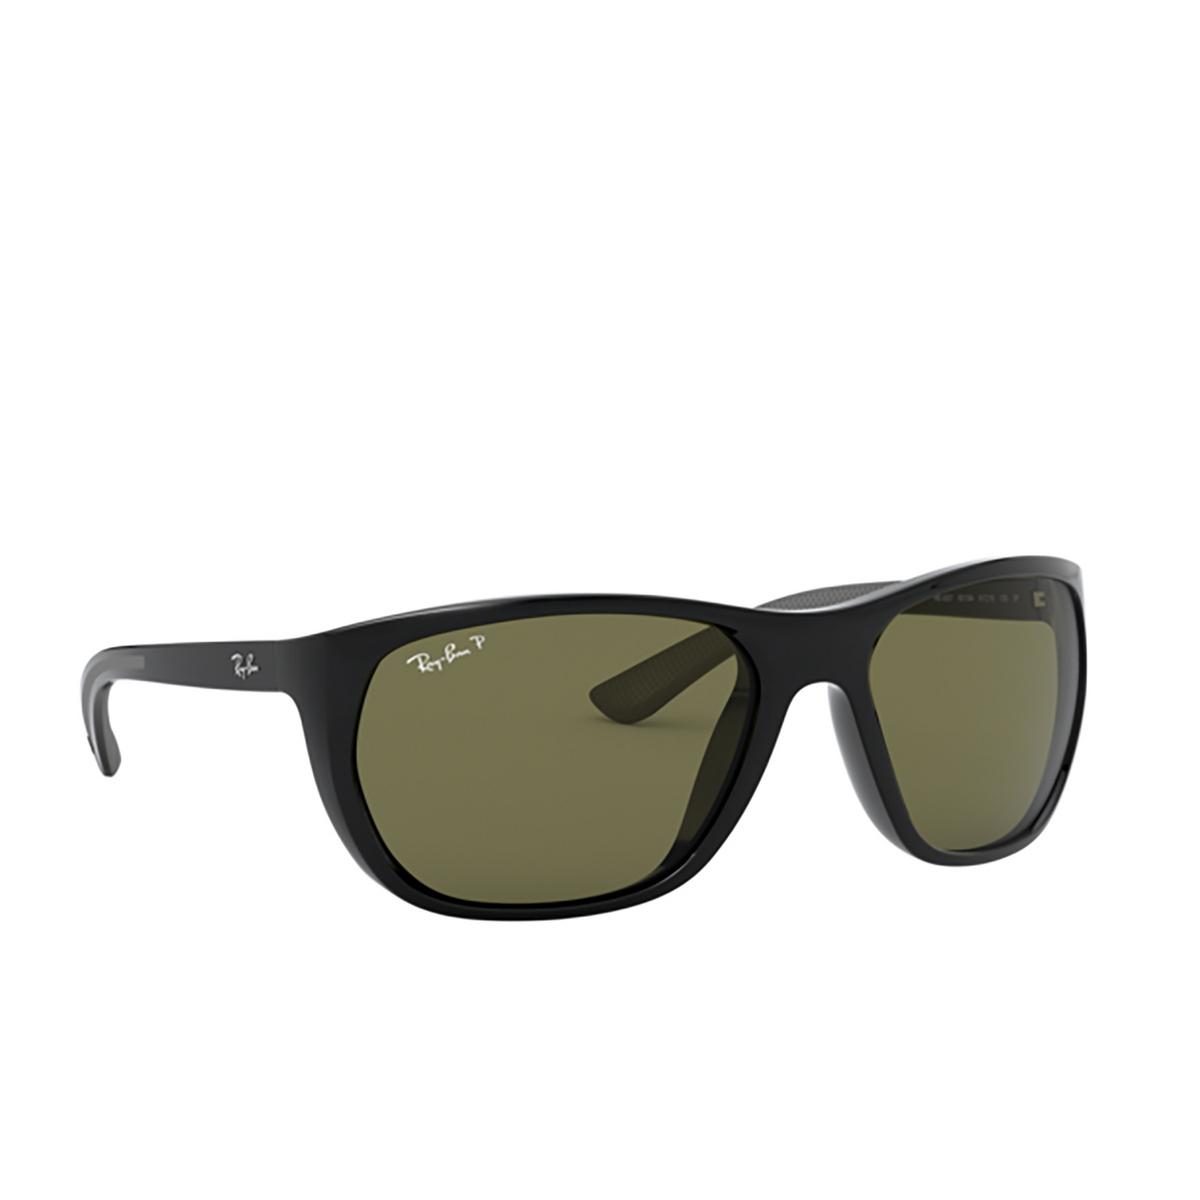 Ray-Ban® Square Sunglasses: RB4307 color Black 601/9A - 2/3.